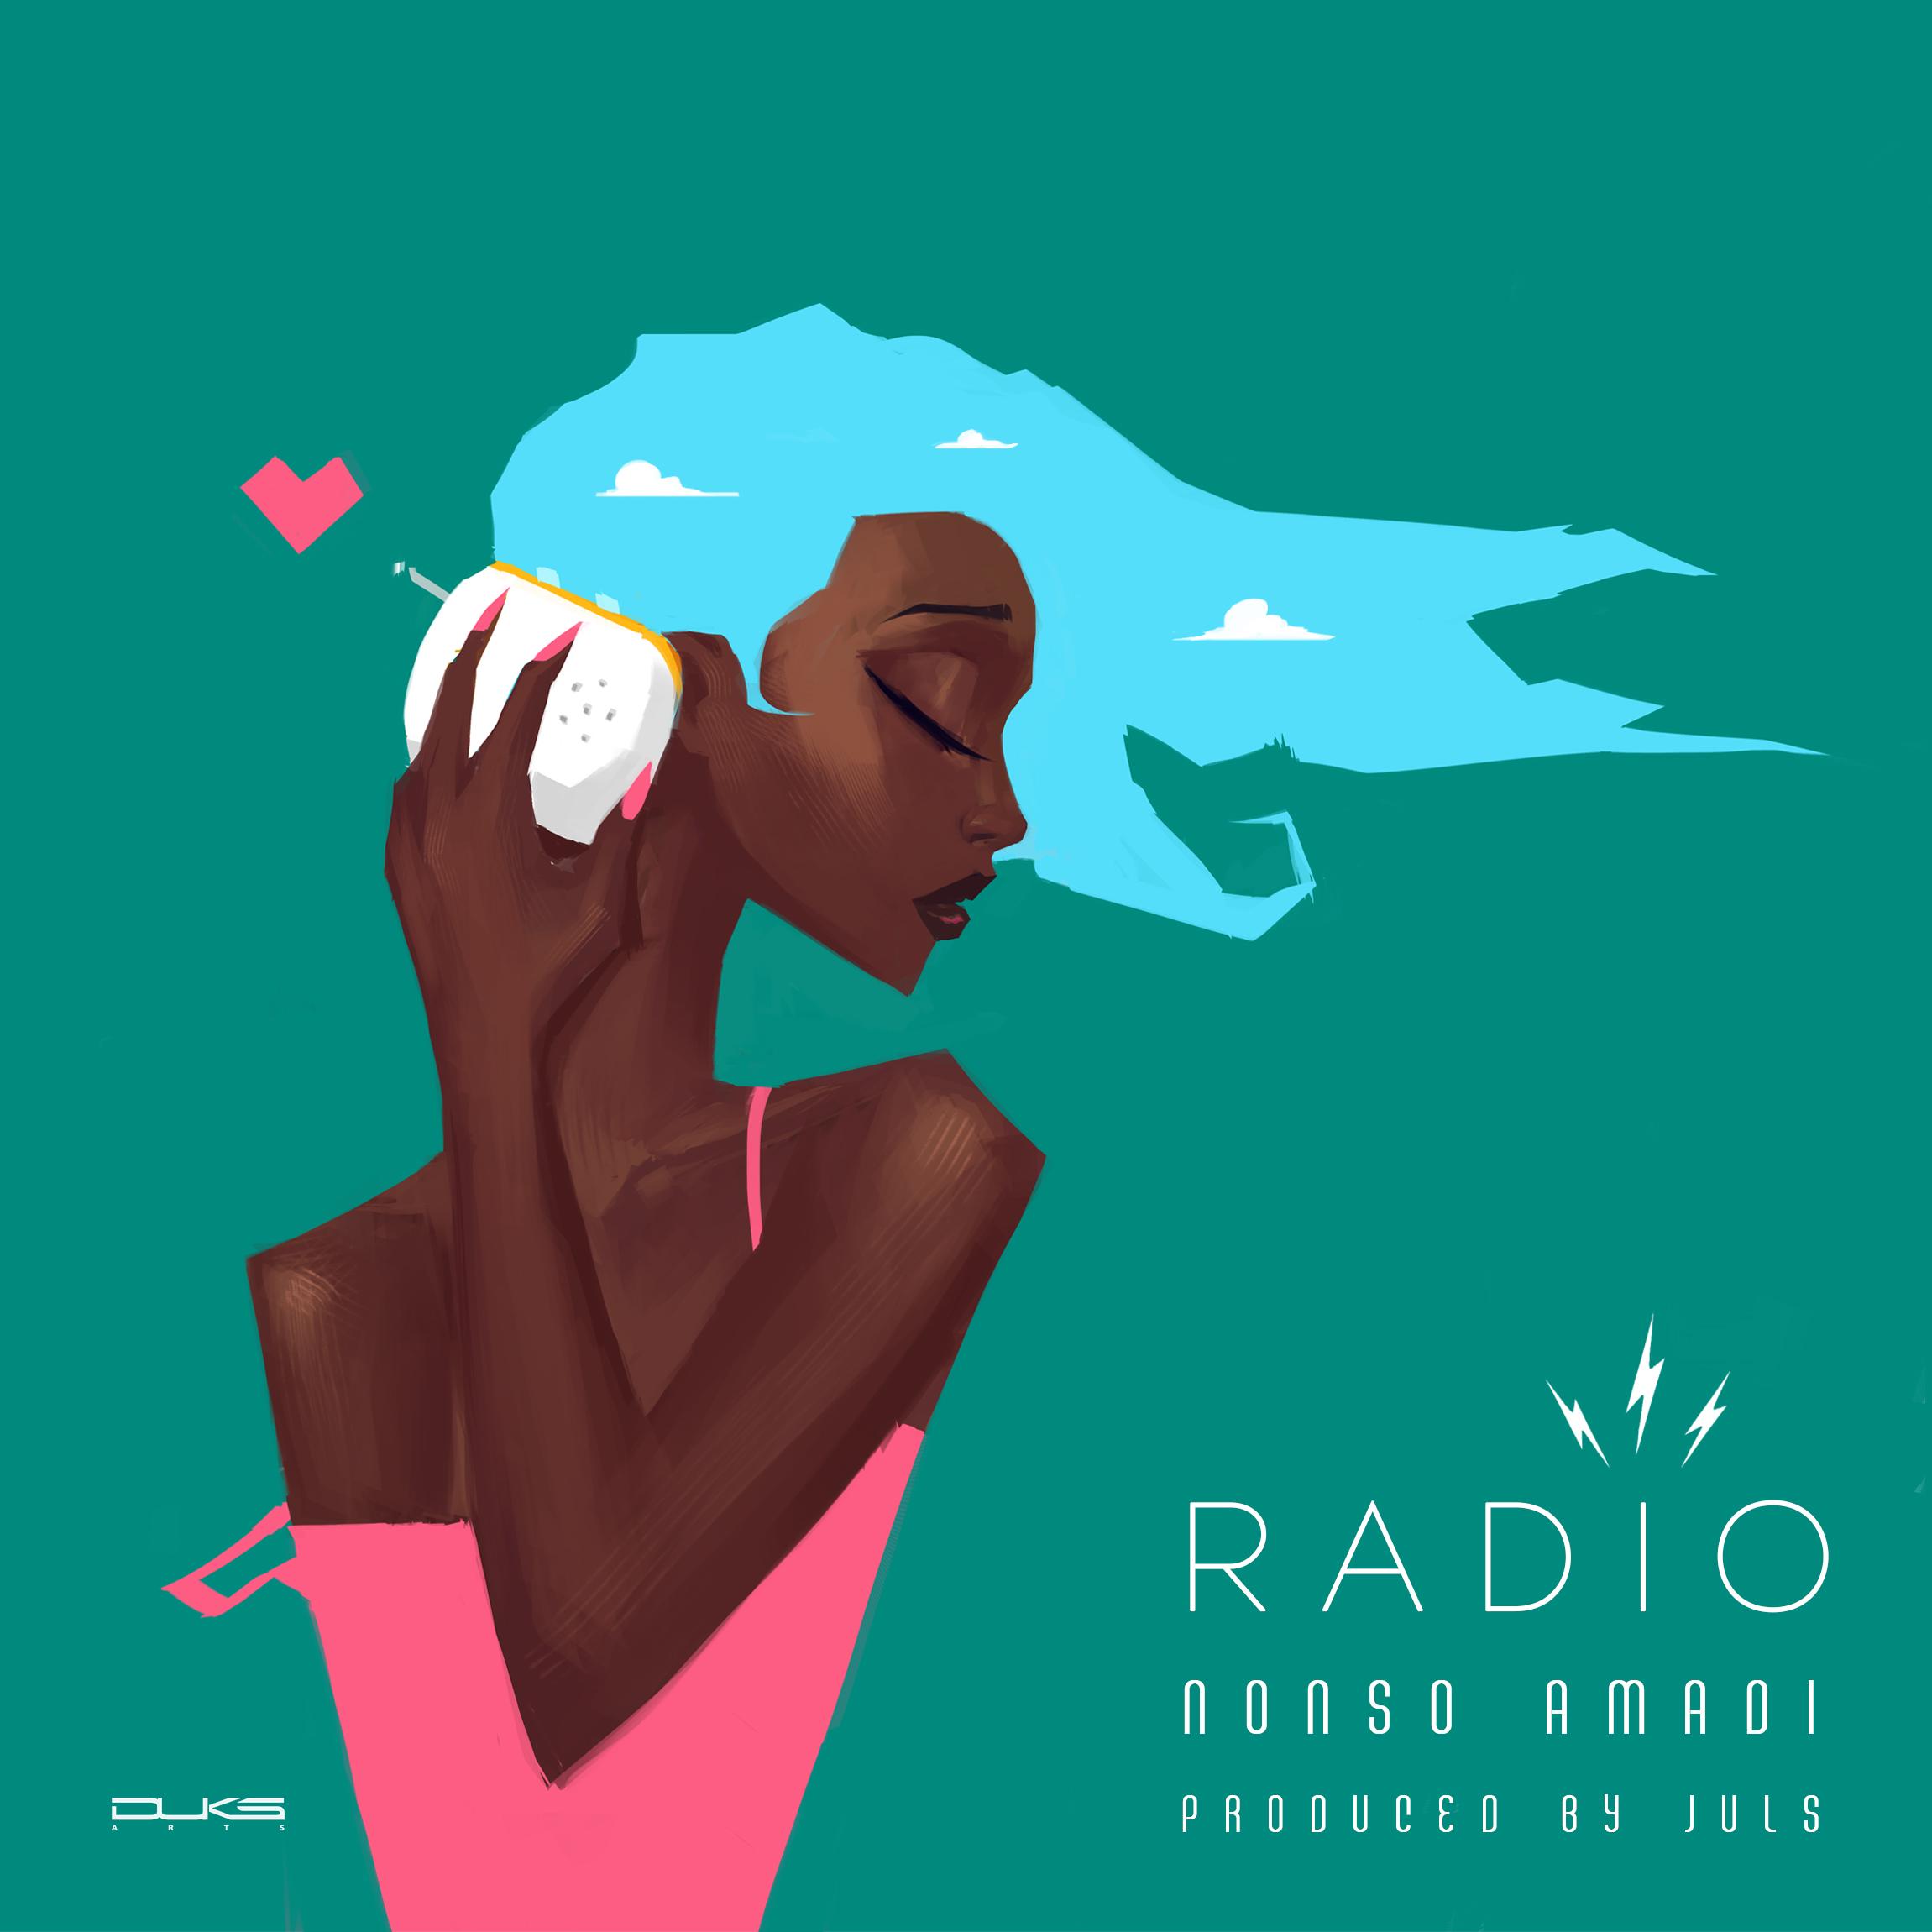 RADIO POSTER.jpg